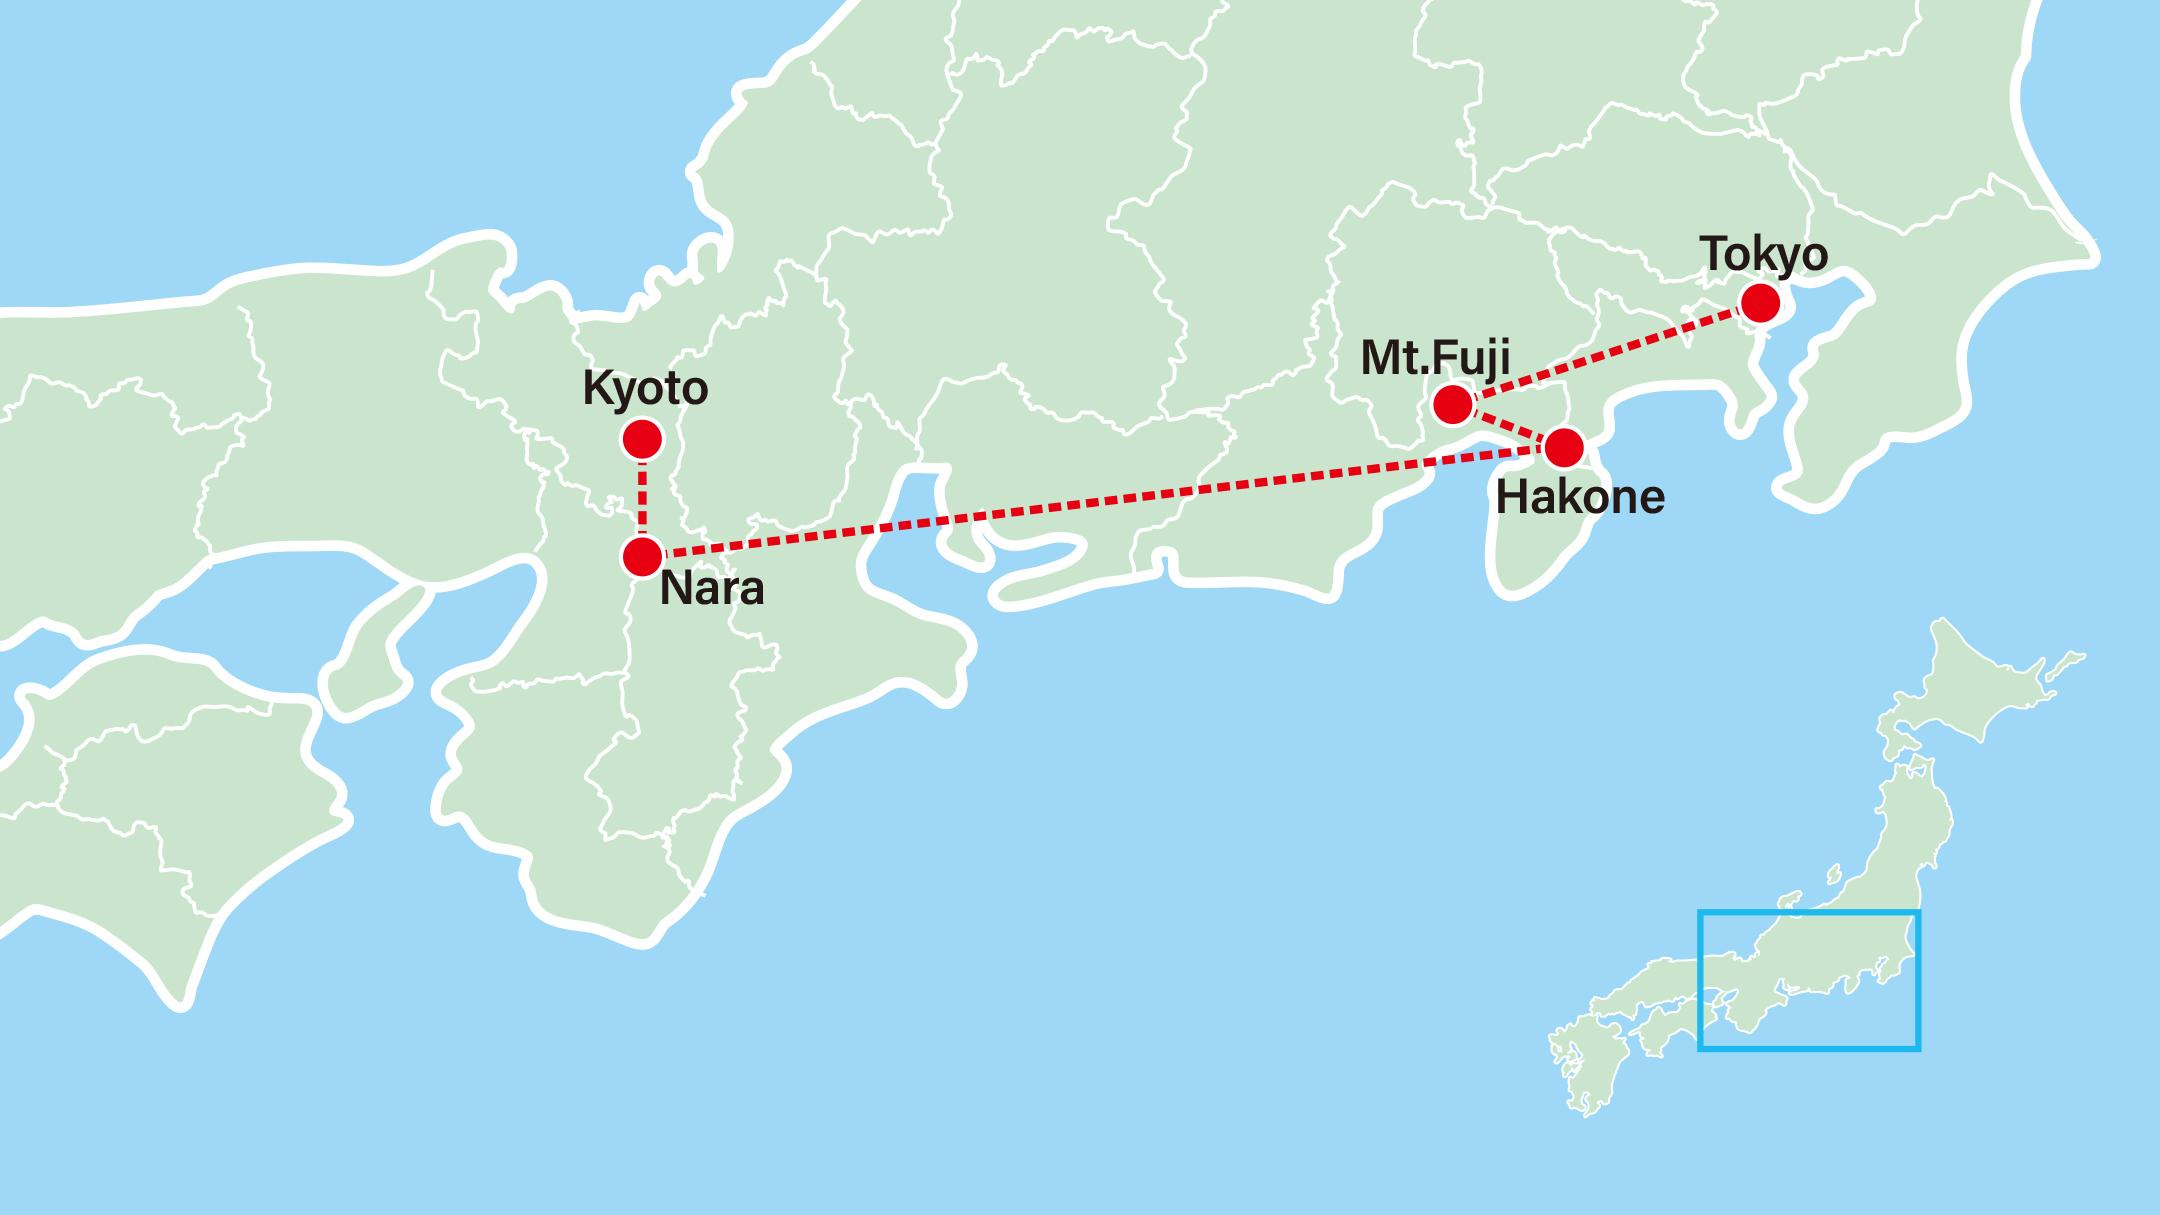 Golden Route of Japan 6 Days-Nara-Kyoto-Hakone-Mt Fuji-Tokyo-Yokohama